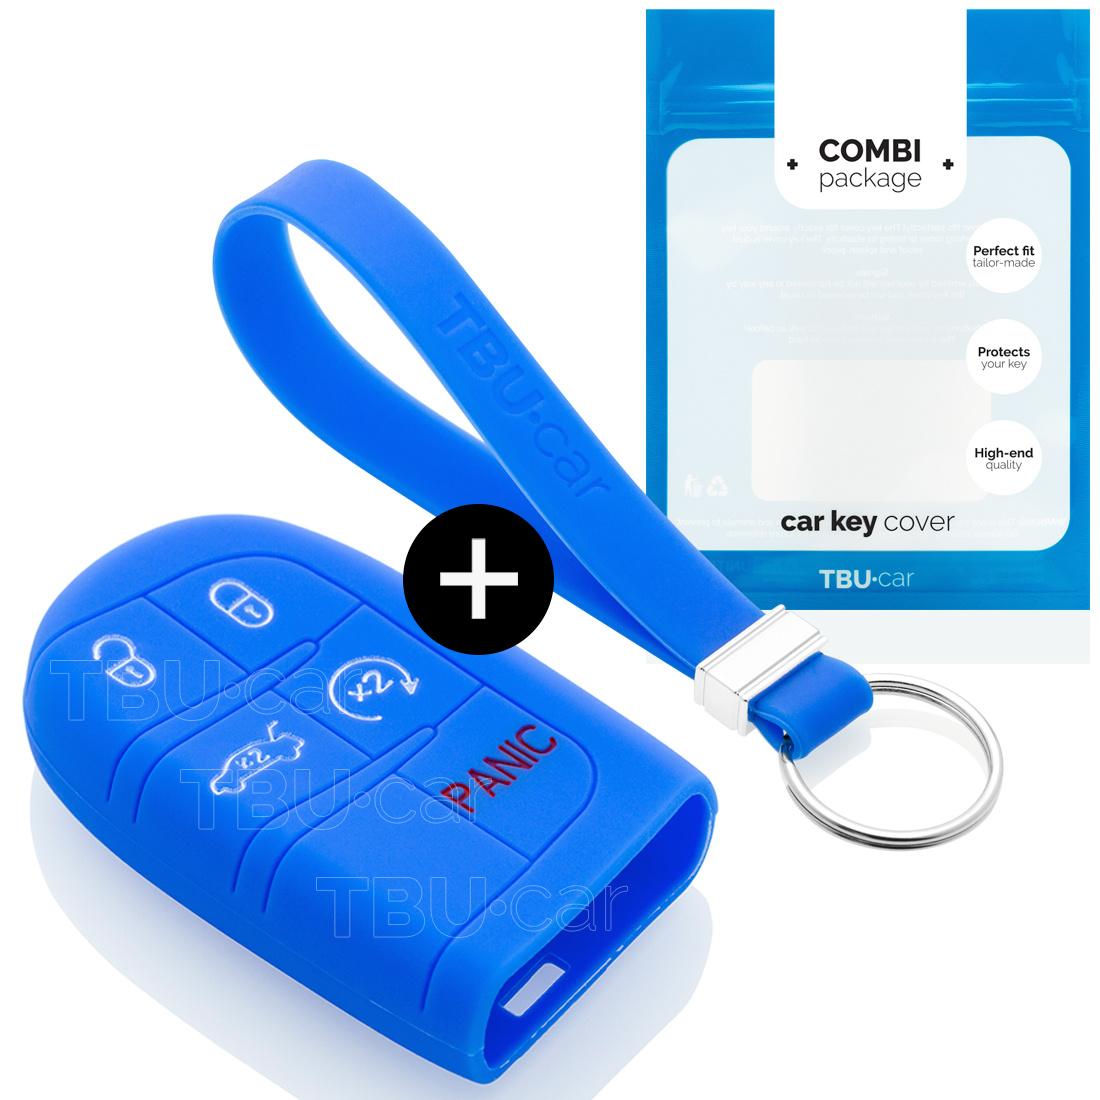 TBU car TBU car Autoschlüssel Hülle kompatibel mit Jeep 5 Tasten (Keyless Entry) - Schutzhülle aus Silikon - Auto Schlüsselhülle Cover in Blau